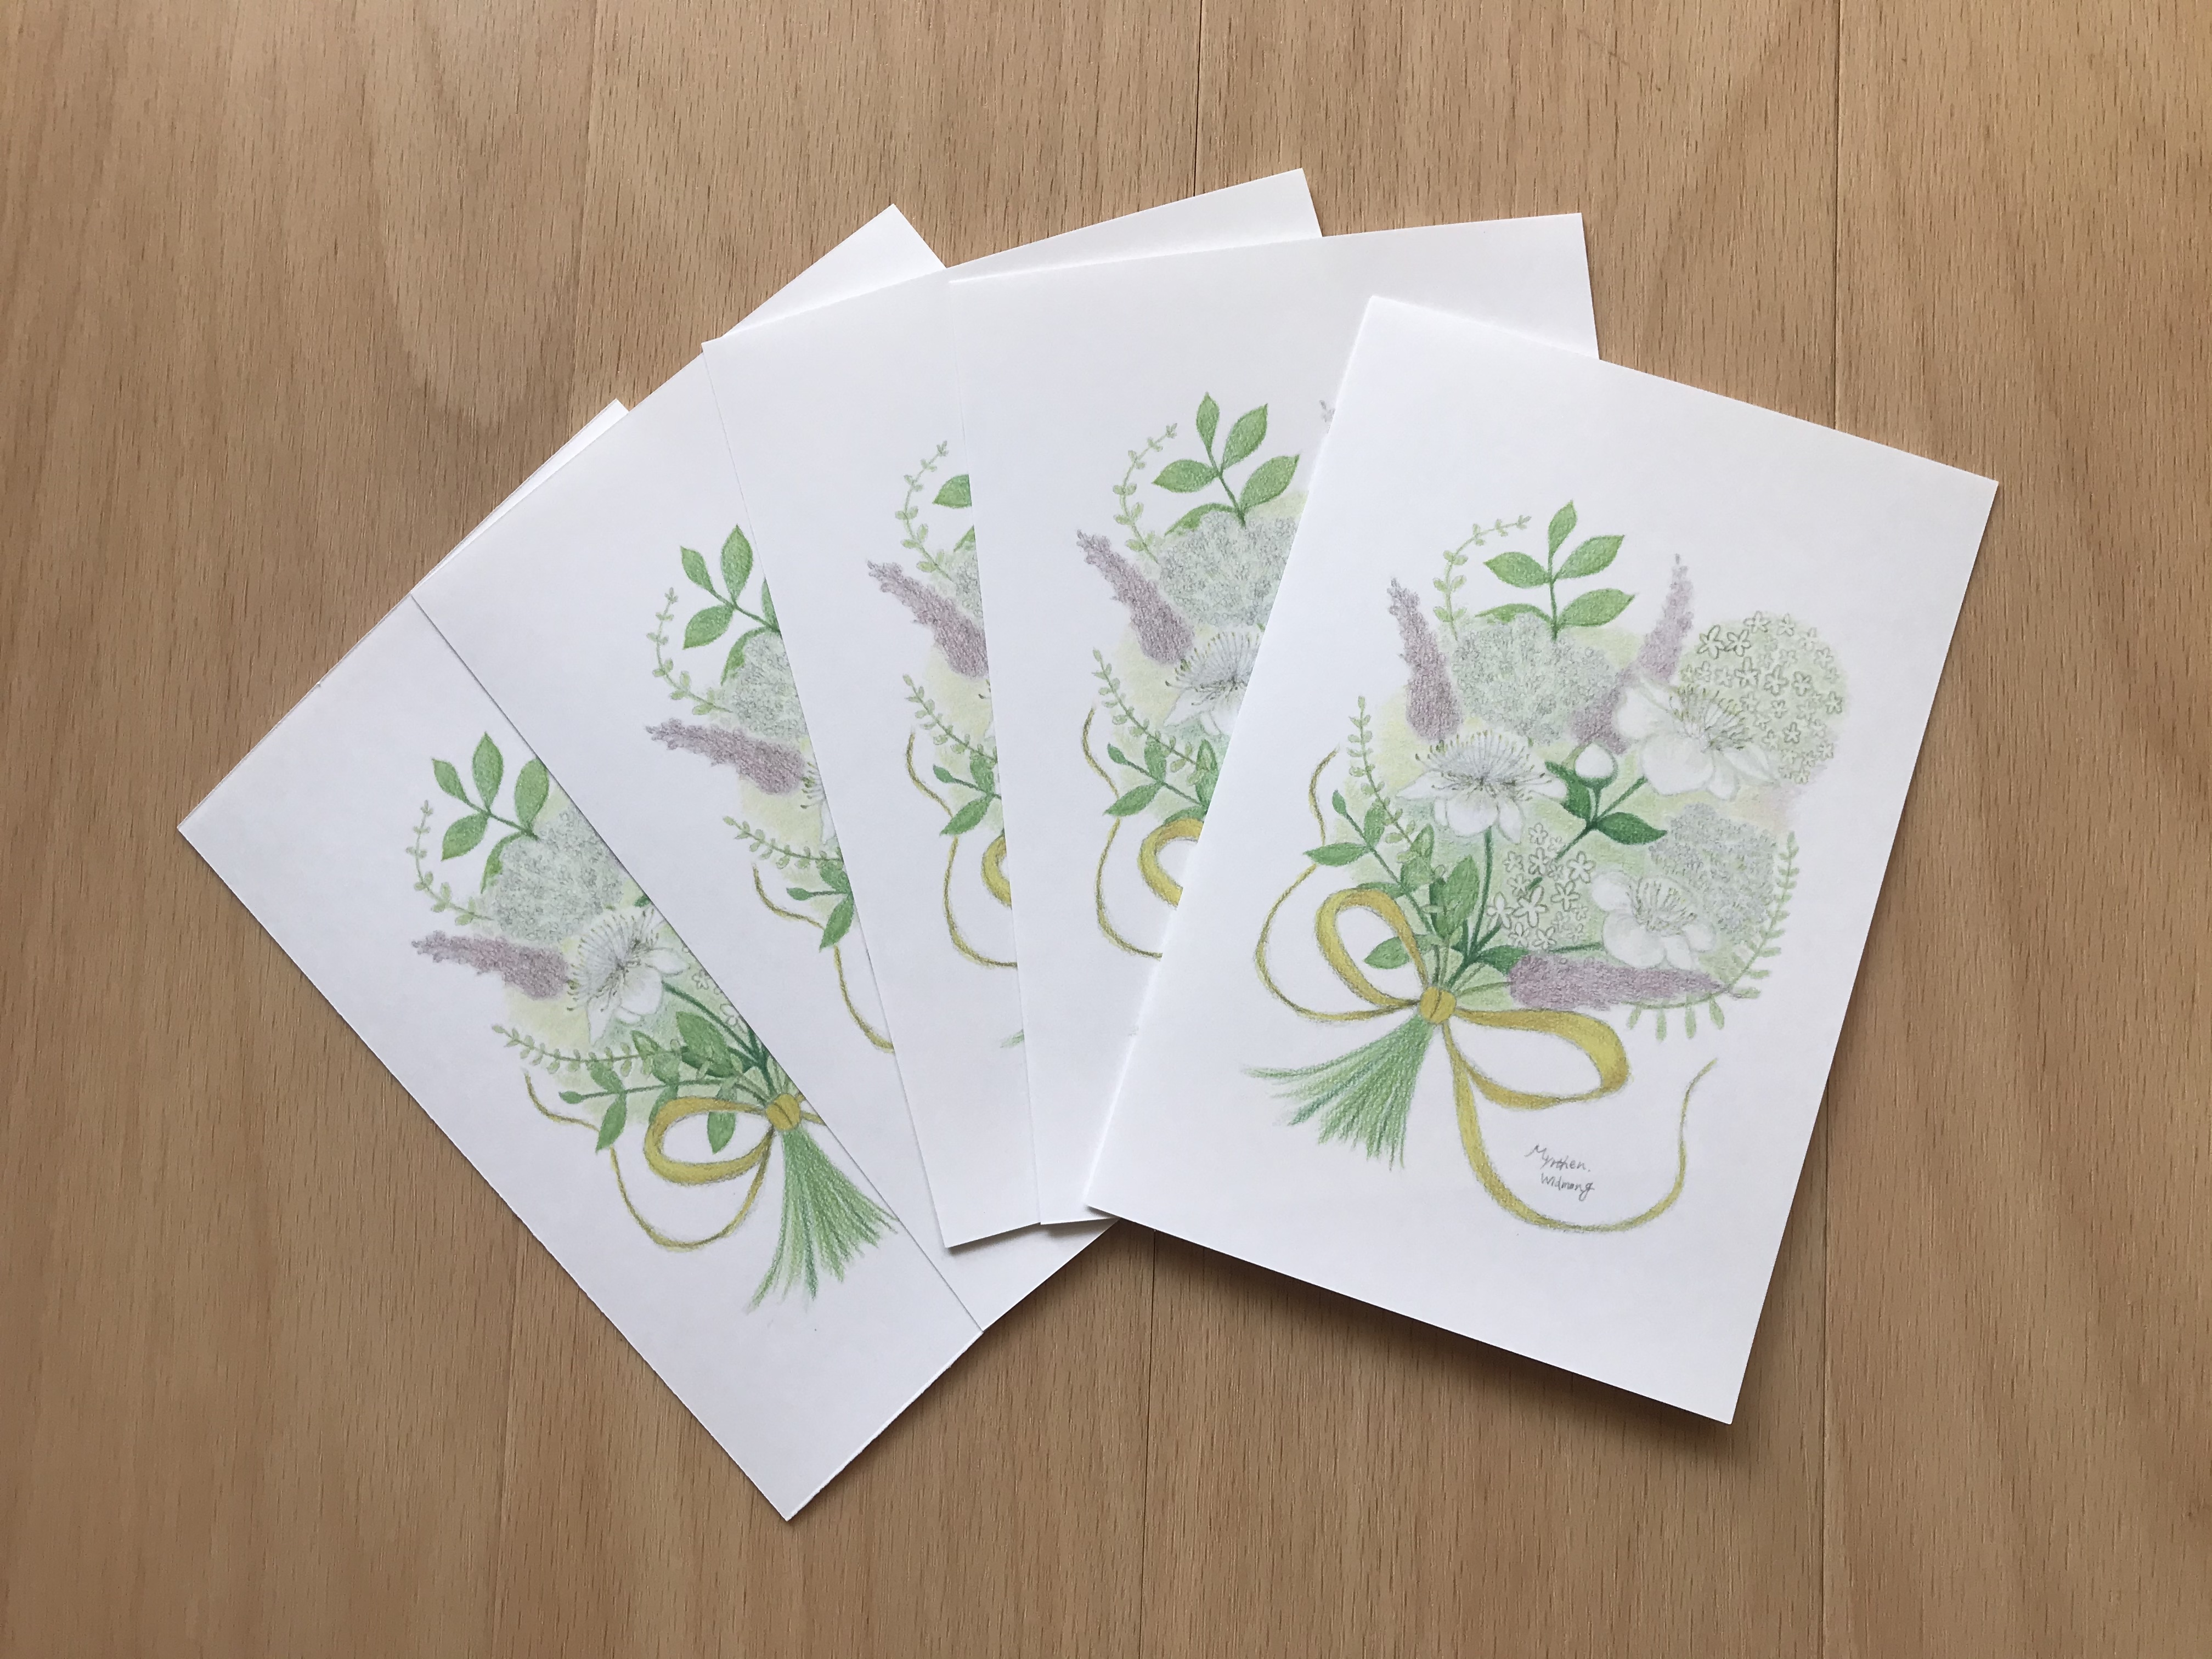 Hibikism vol.Ⅱ ポストカード5枚セット『ミルテの花 / シューマン(リスト編曲)献呈』